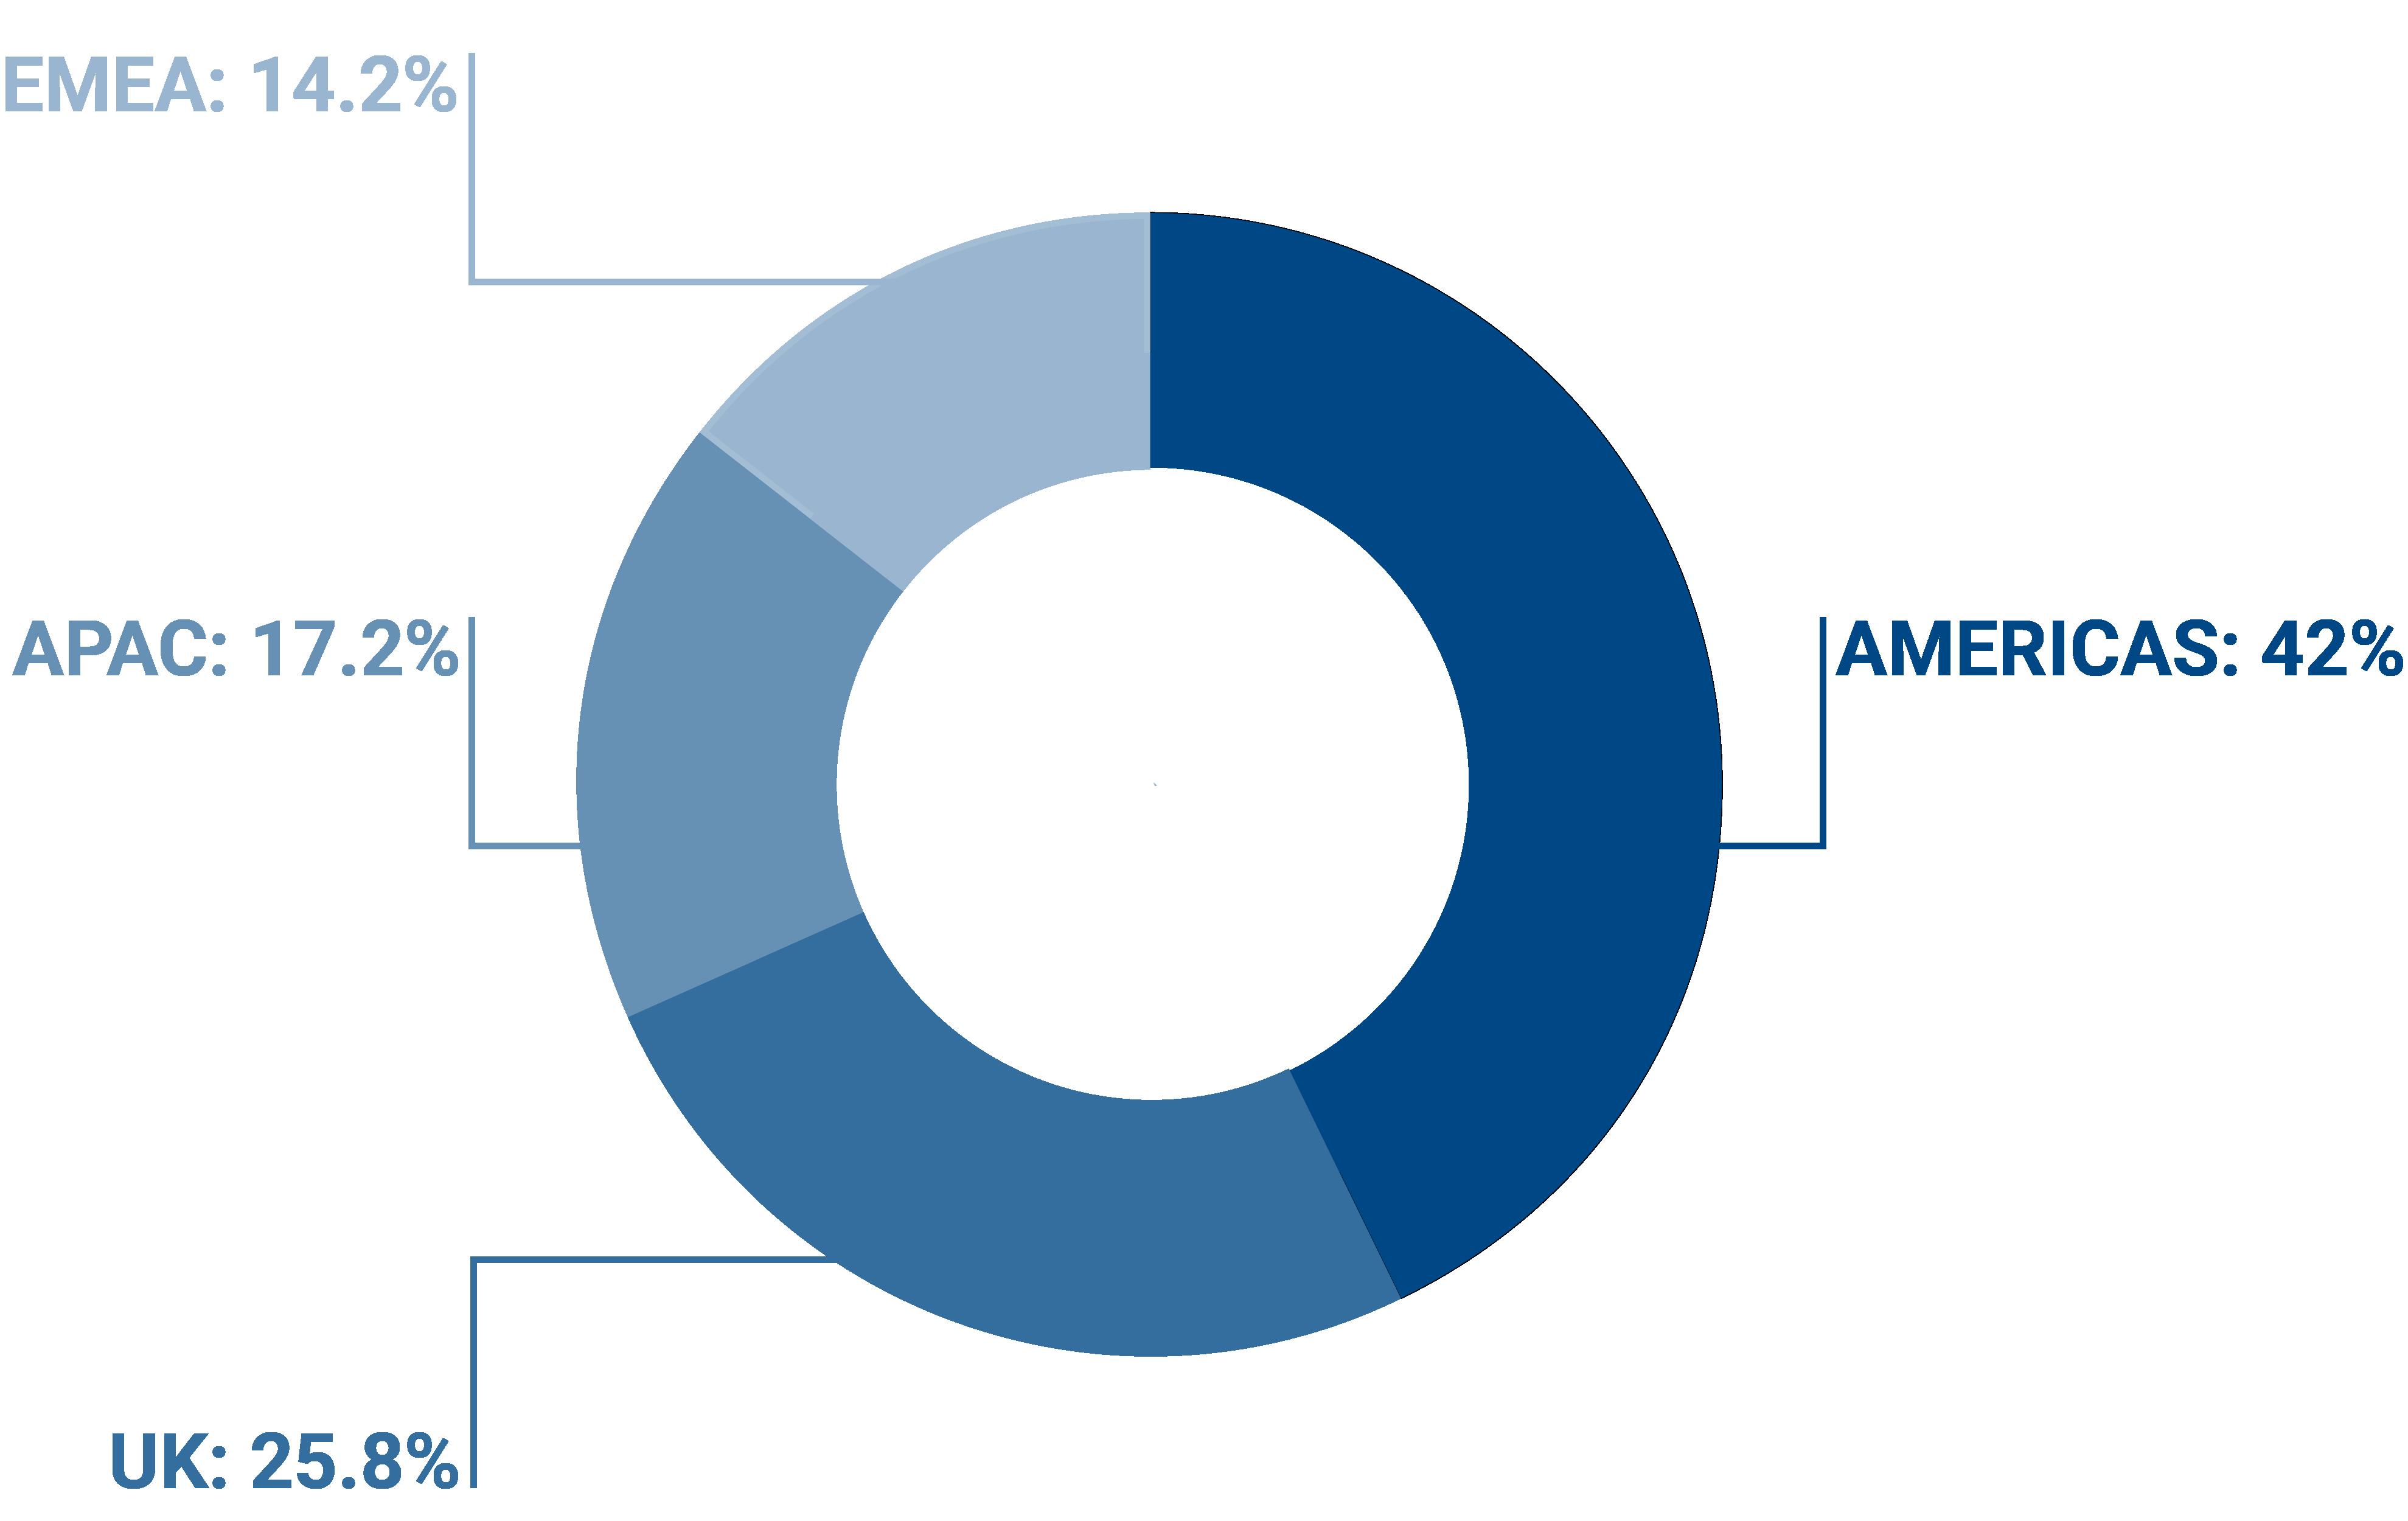 Chart image